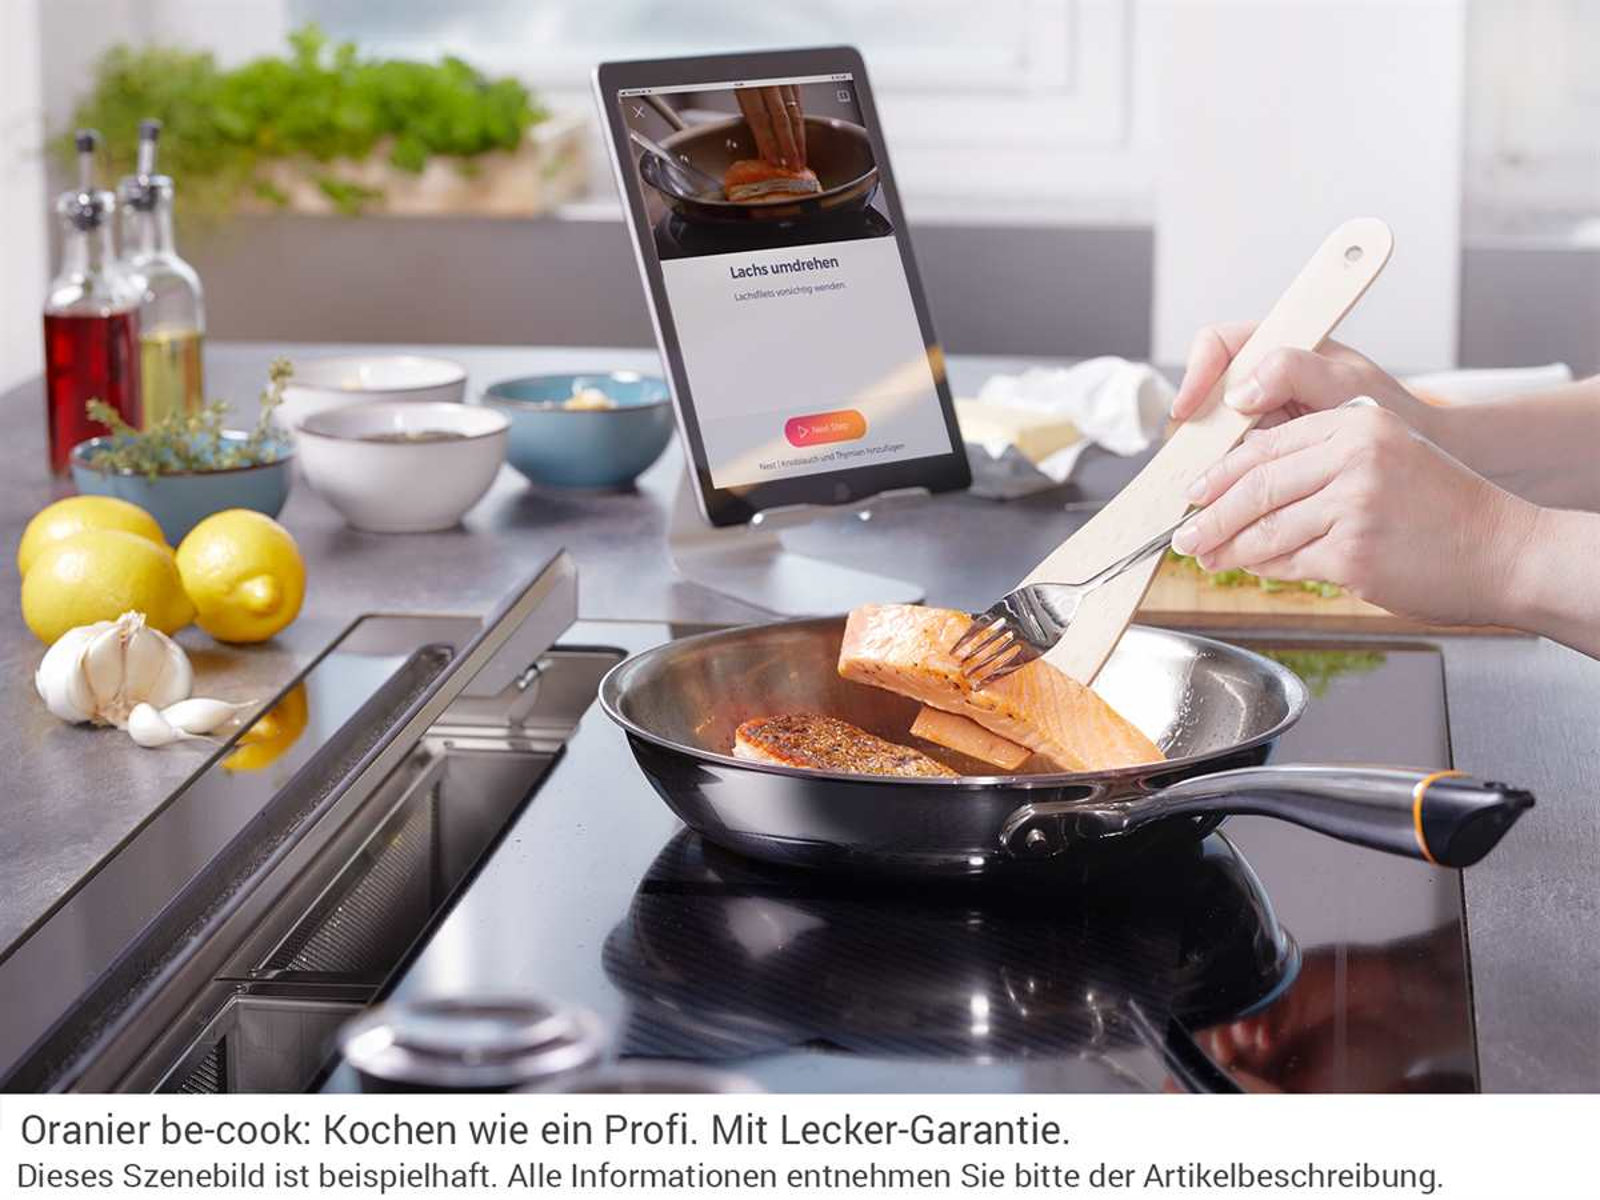 Oranier kfl be cook induktionskochfeld dunstabzug